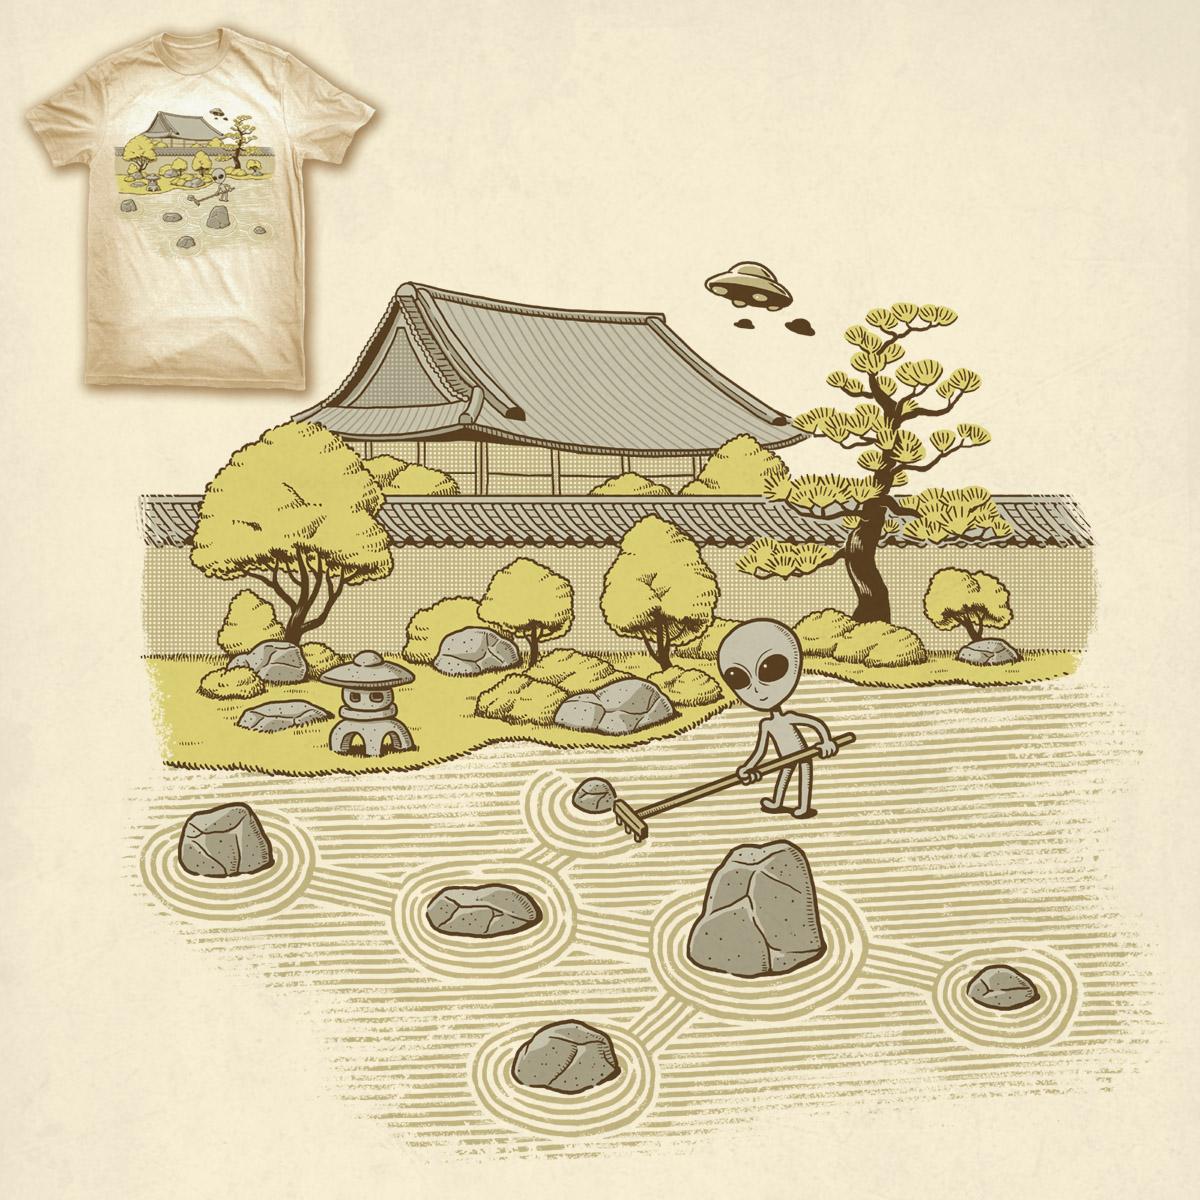 Karesansui Crop Circles by ben chen on Threadless